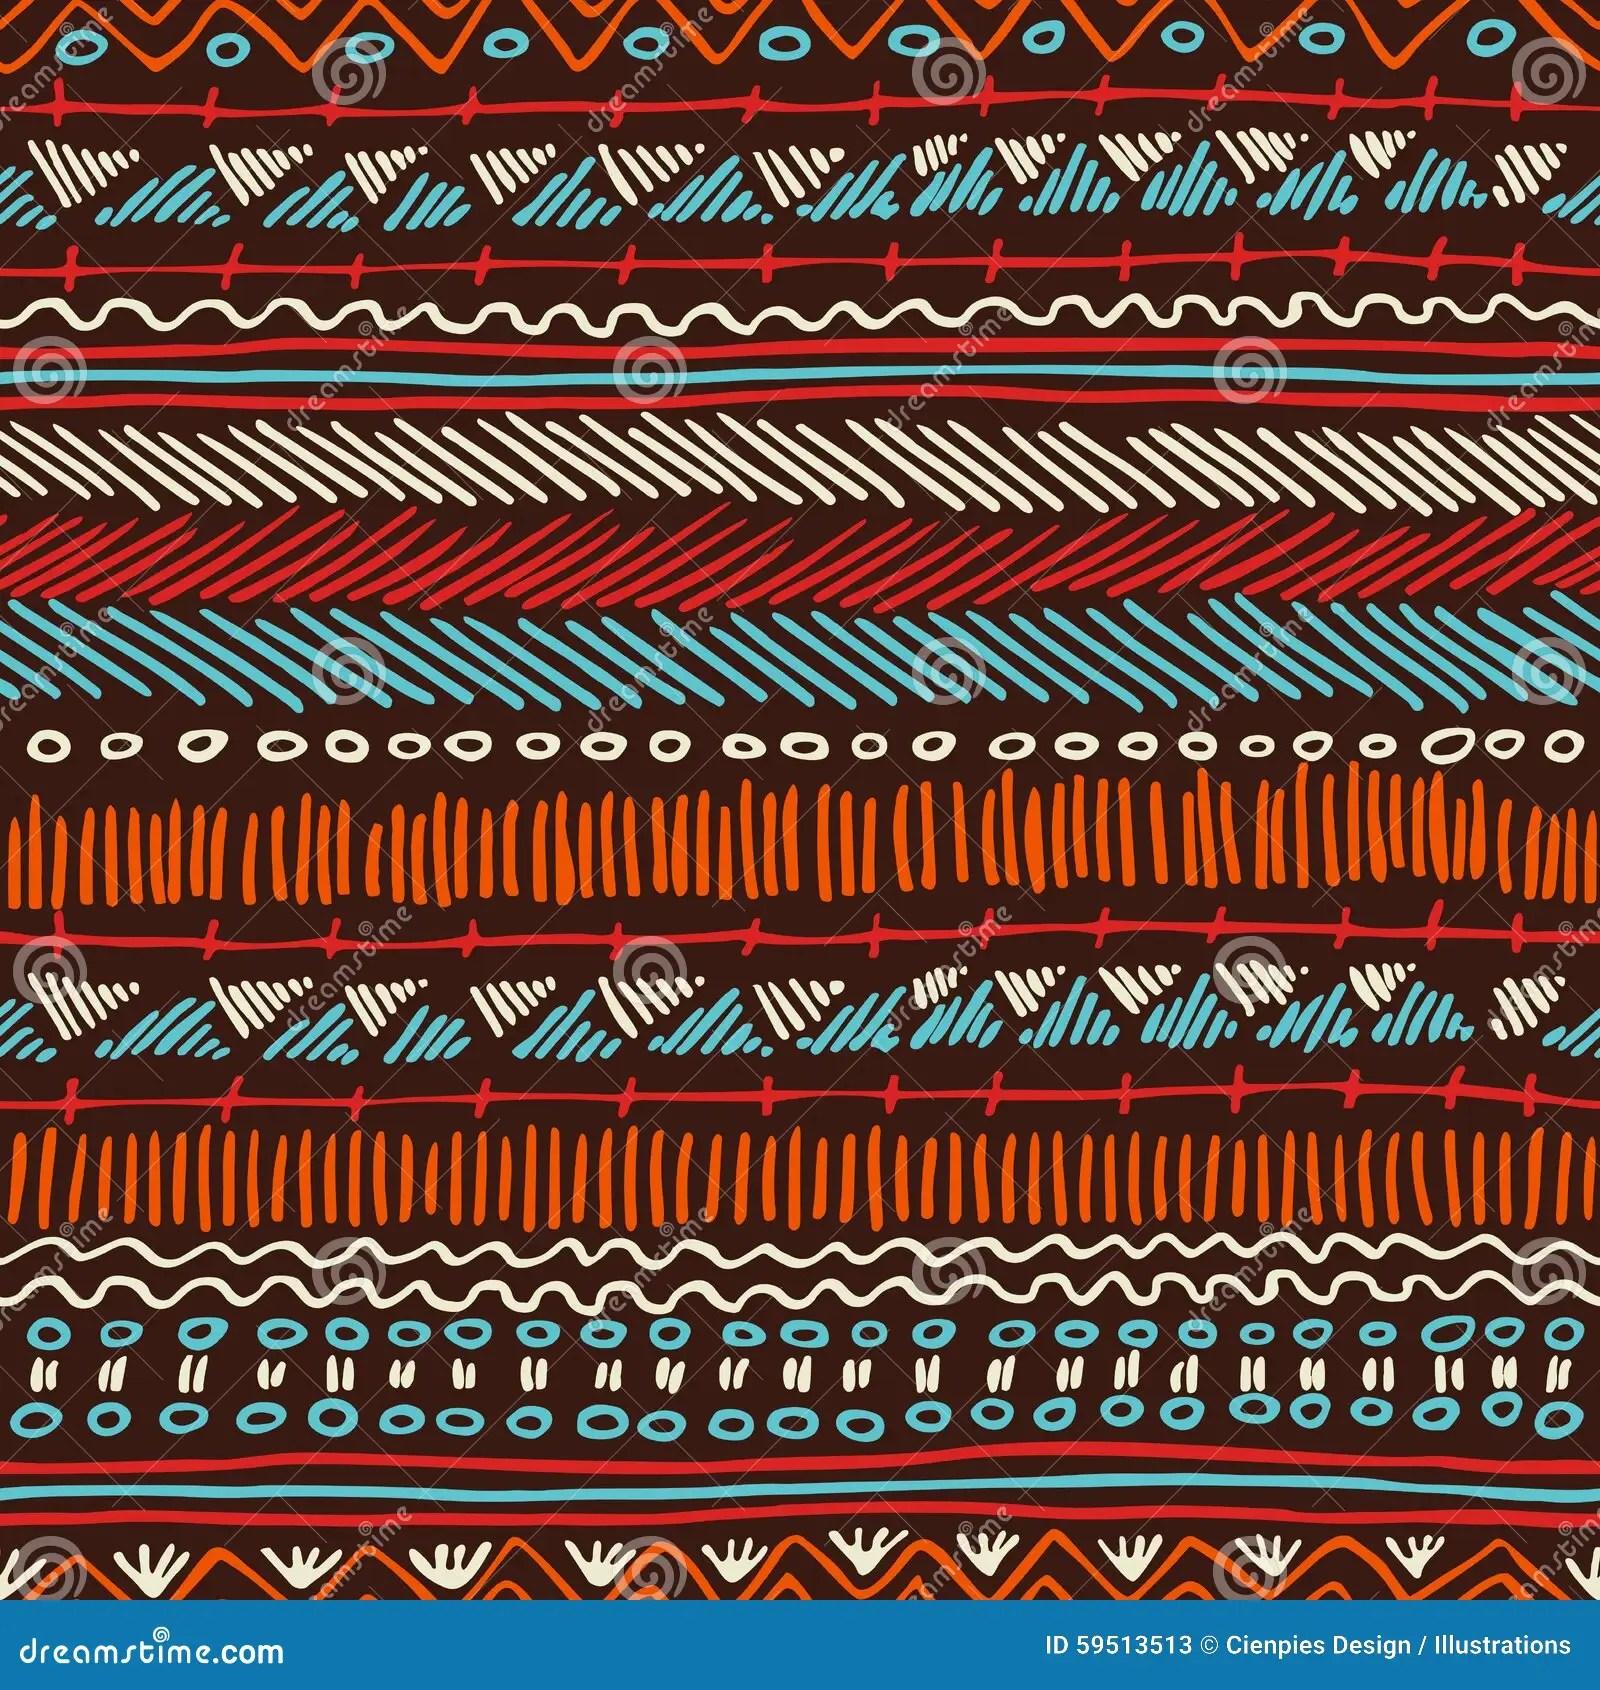 Cute Tribal Print Wallpaper Boho Seamless Pattern Tribal Vintage Background Stock